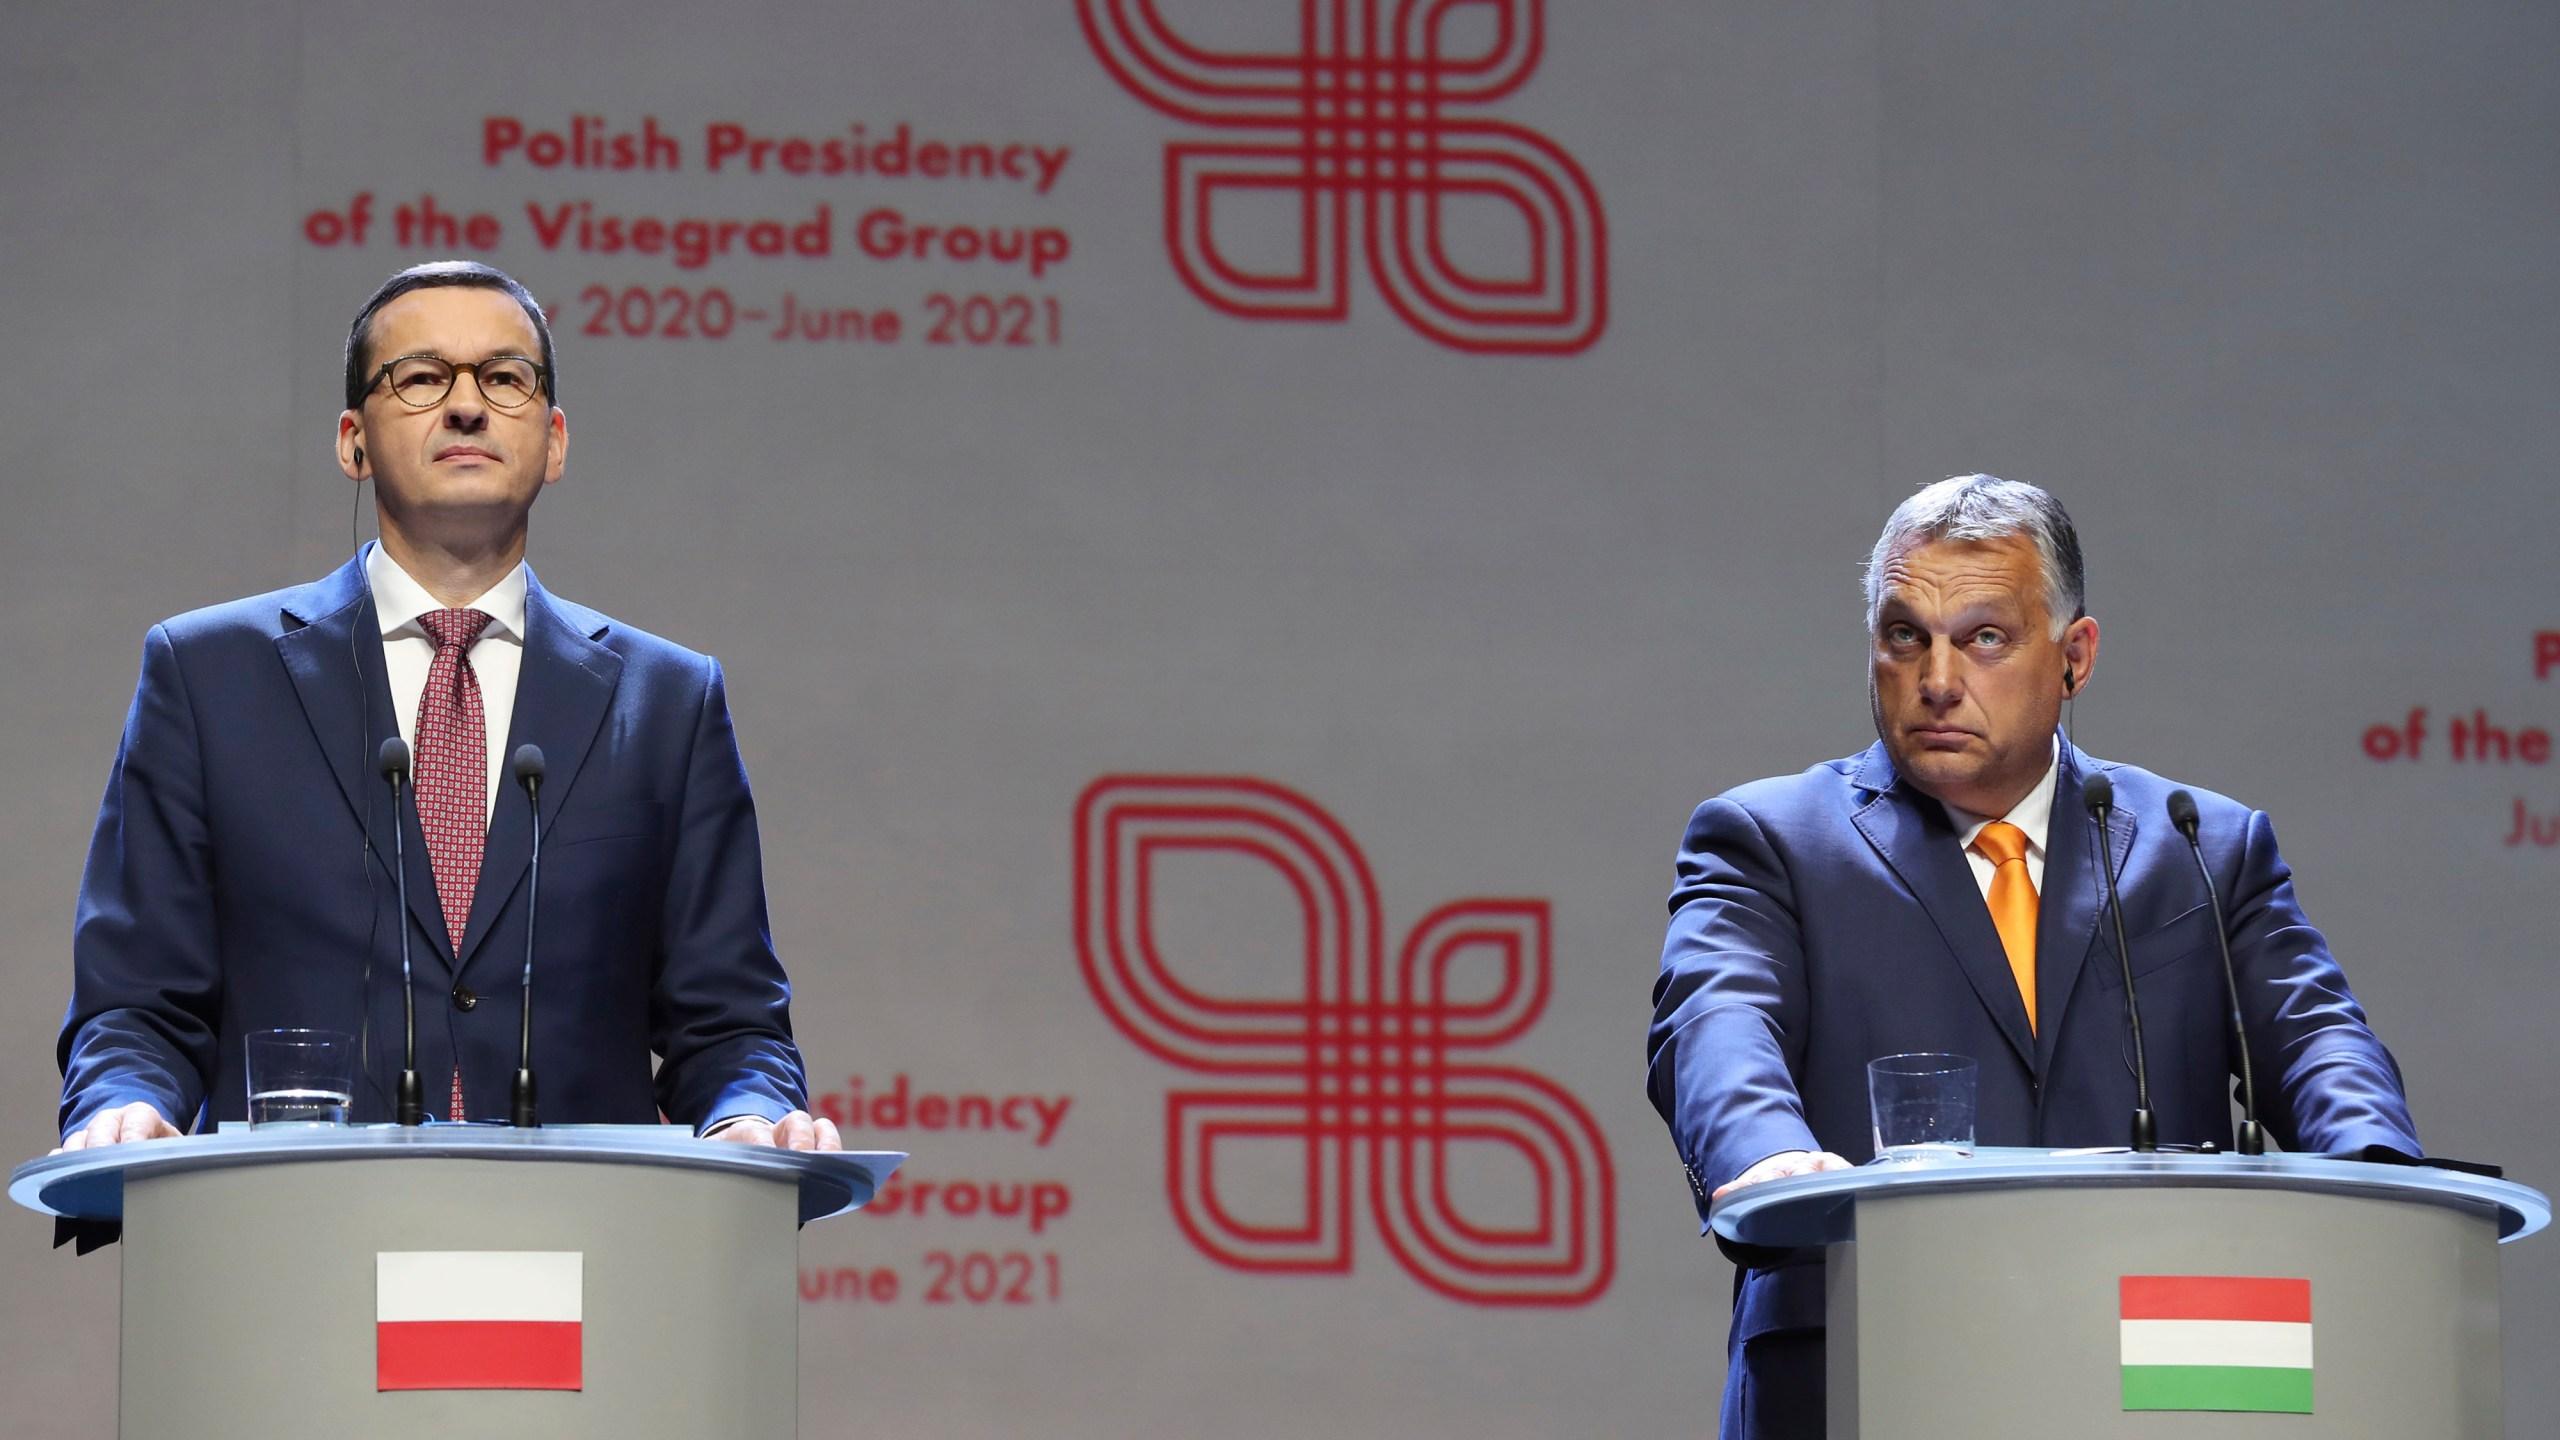 Mateusz Morawiecki, Viktor Orban